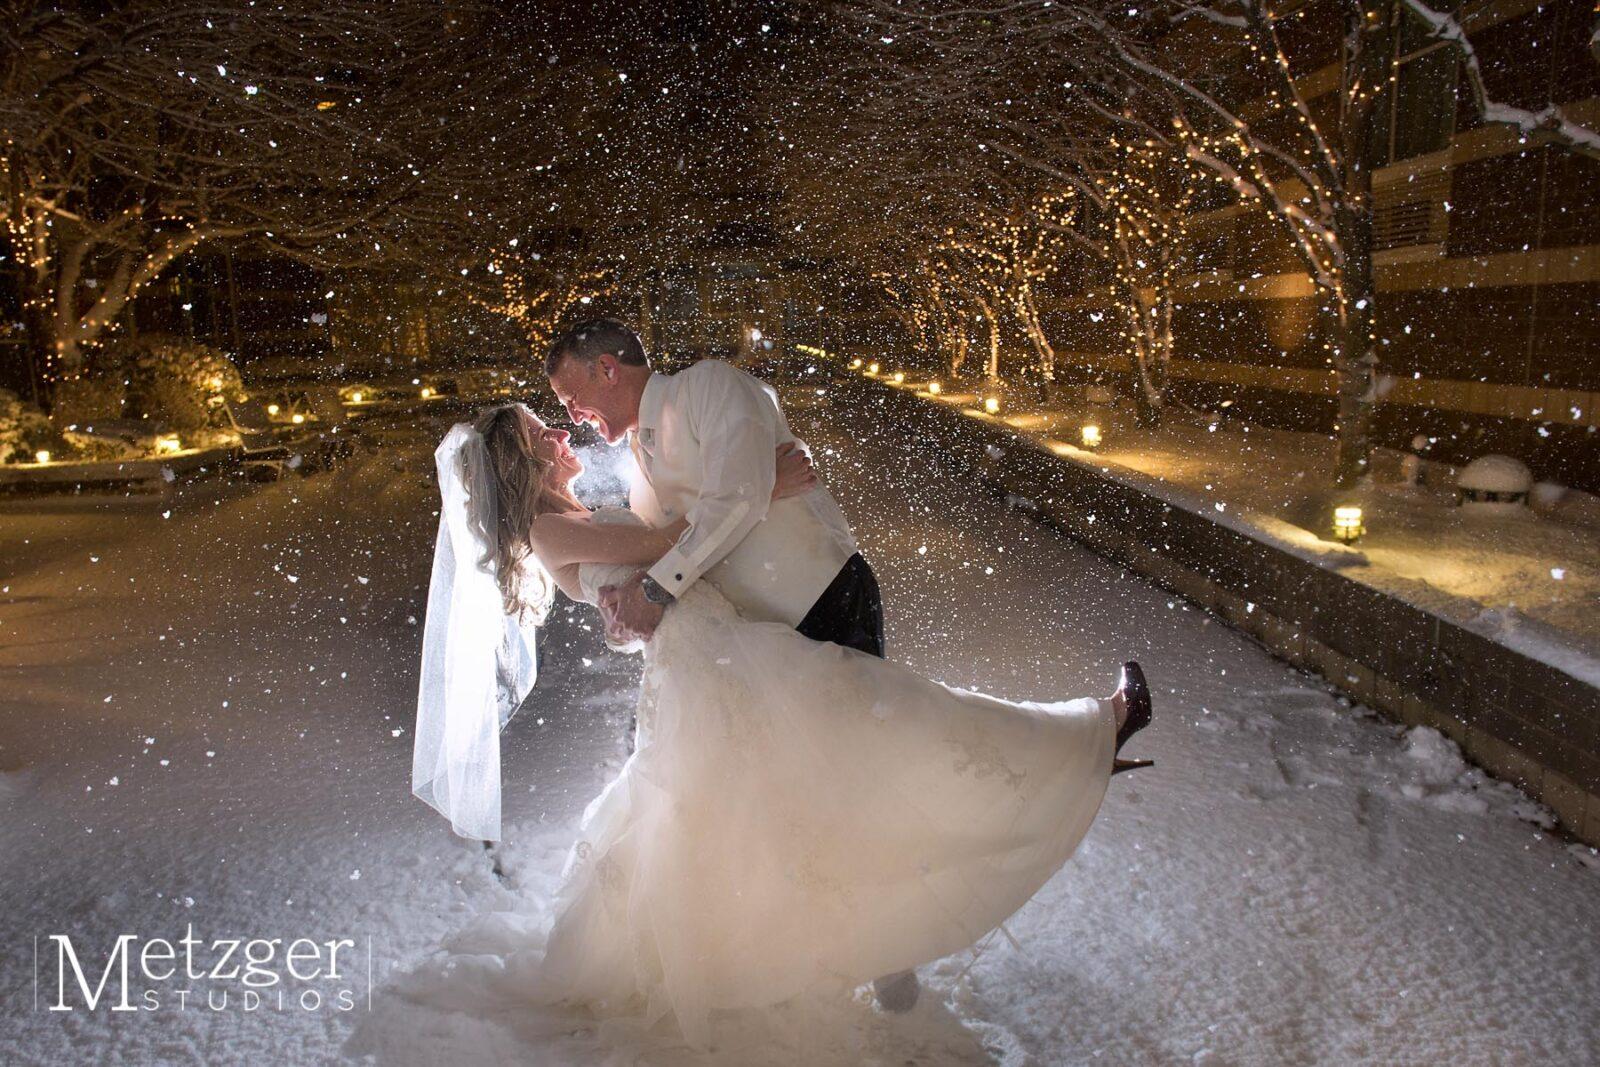 SHERATON NEEDHAM HOTEL WEDDING: MIKE AND KARA